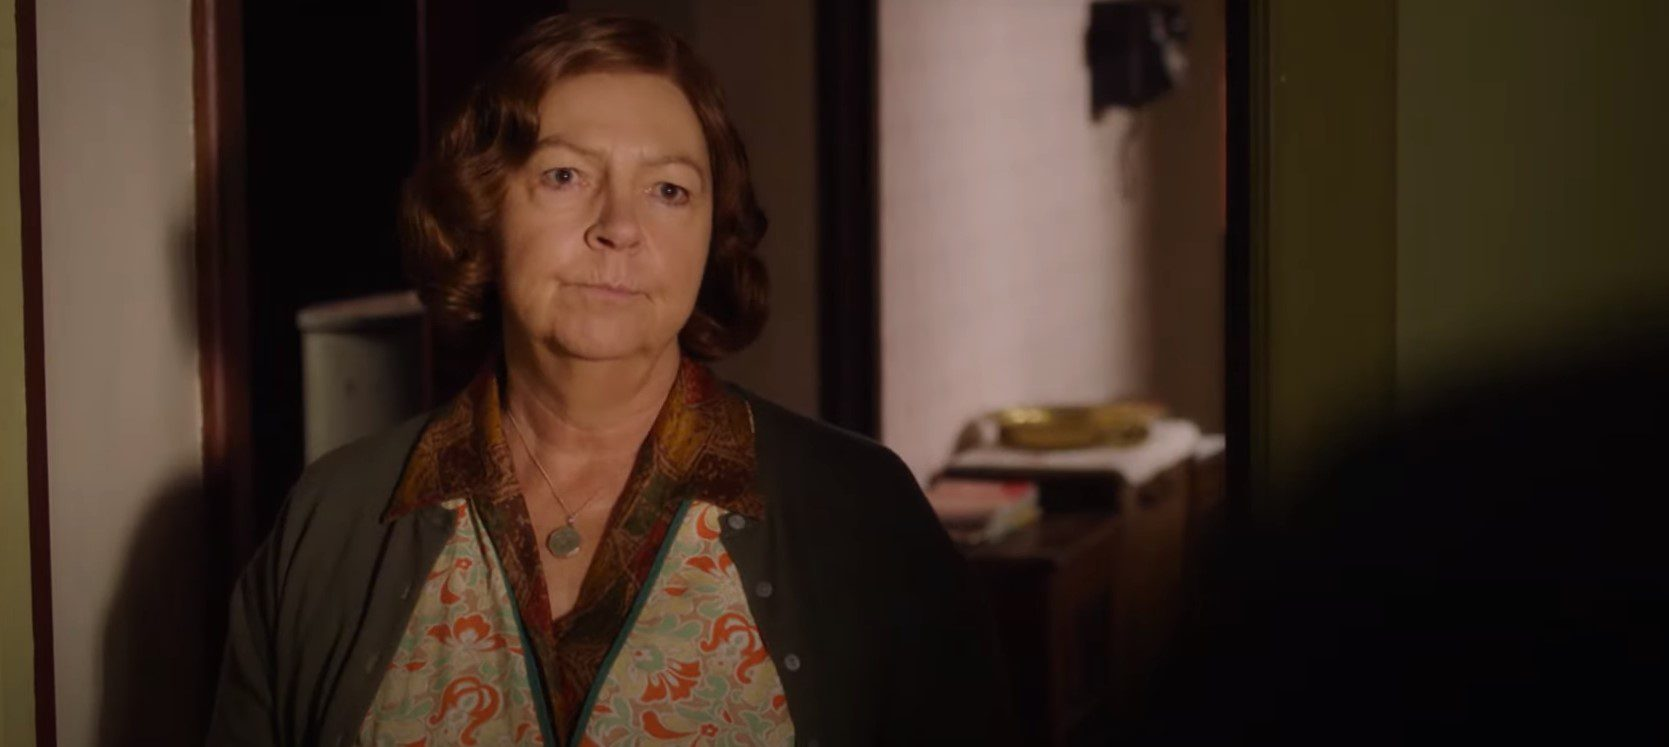 How to watch Grantchester season 6 online?